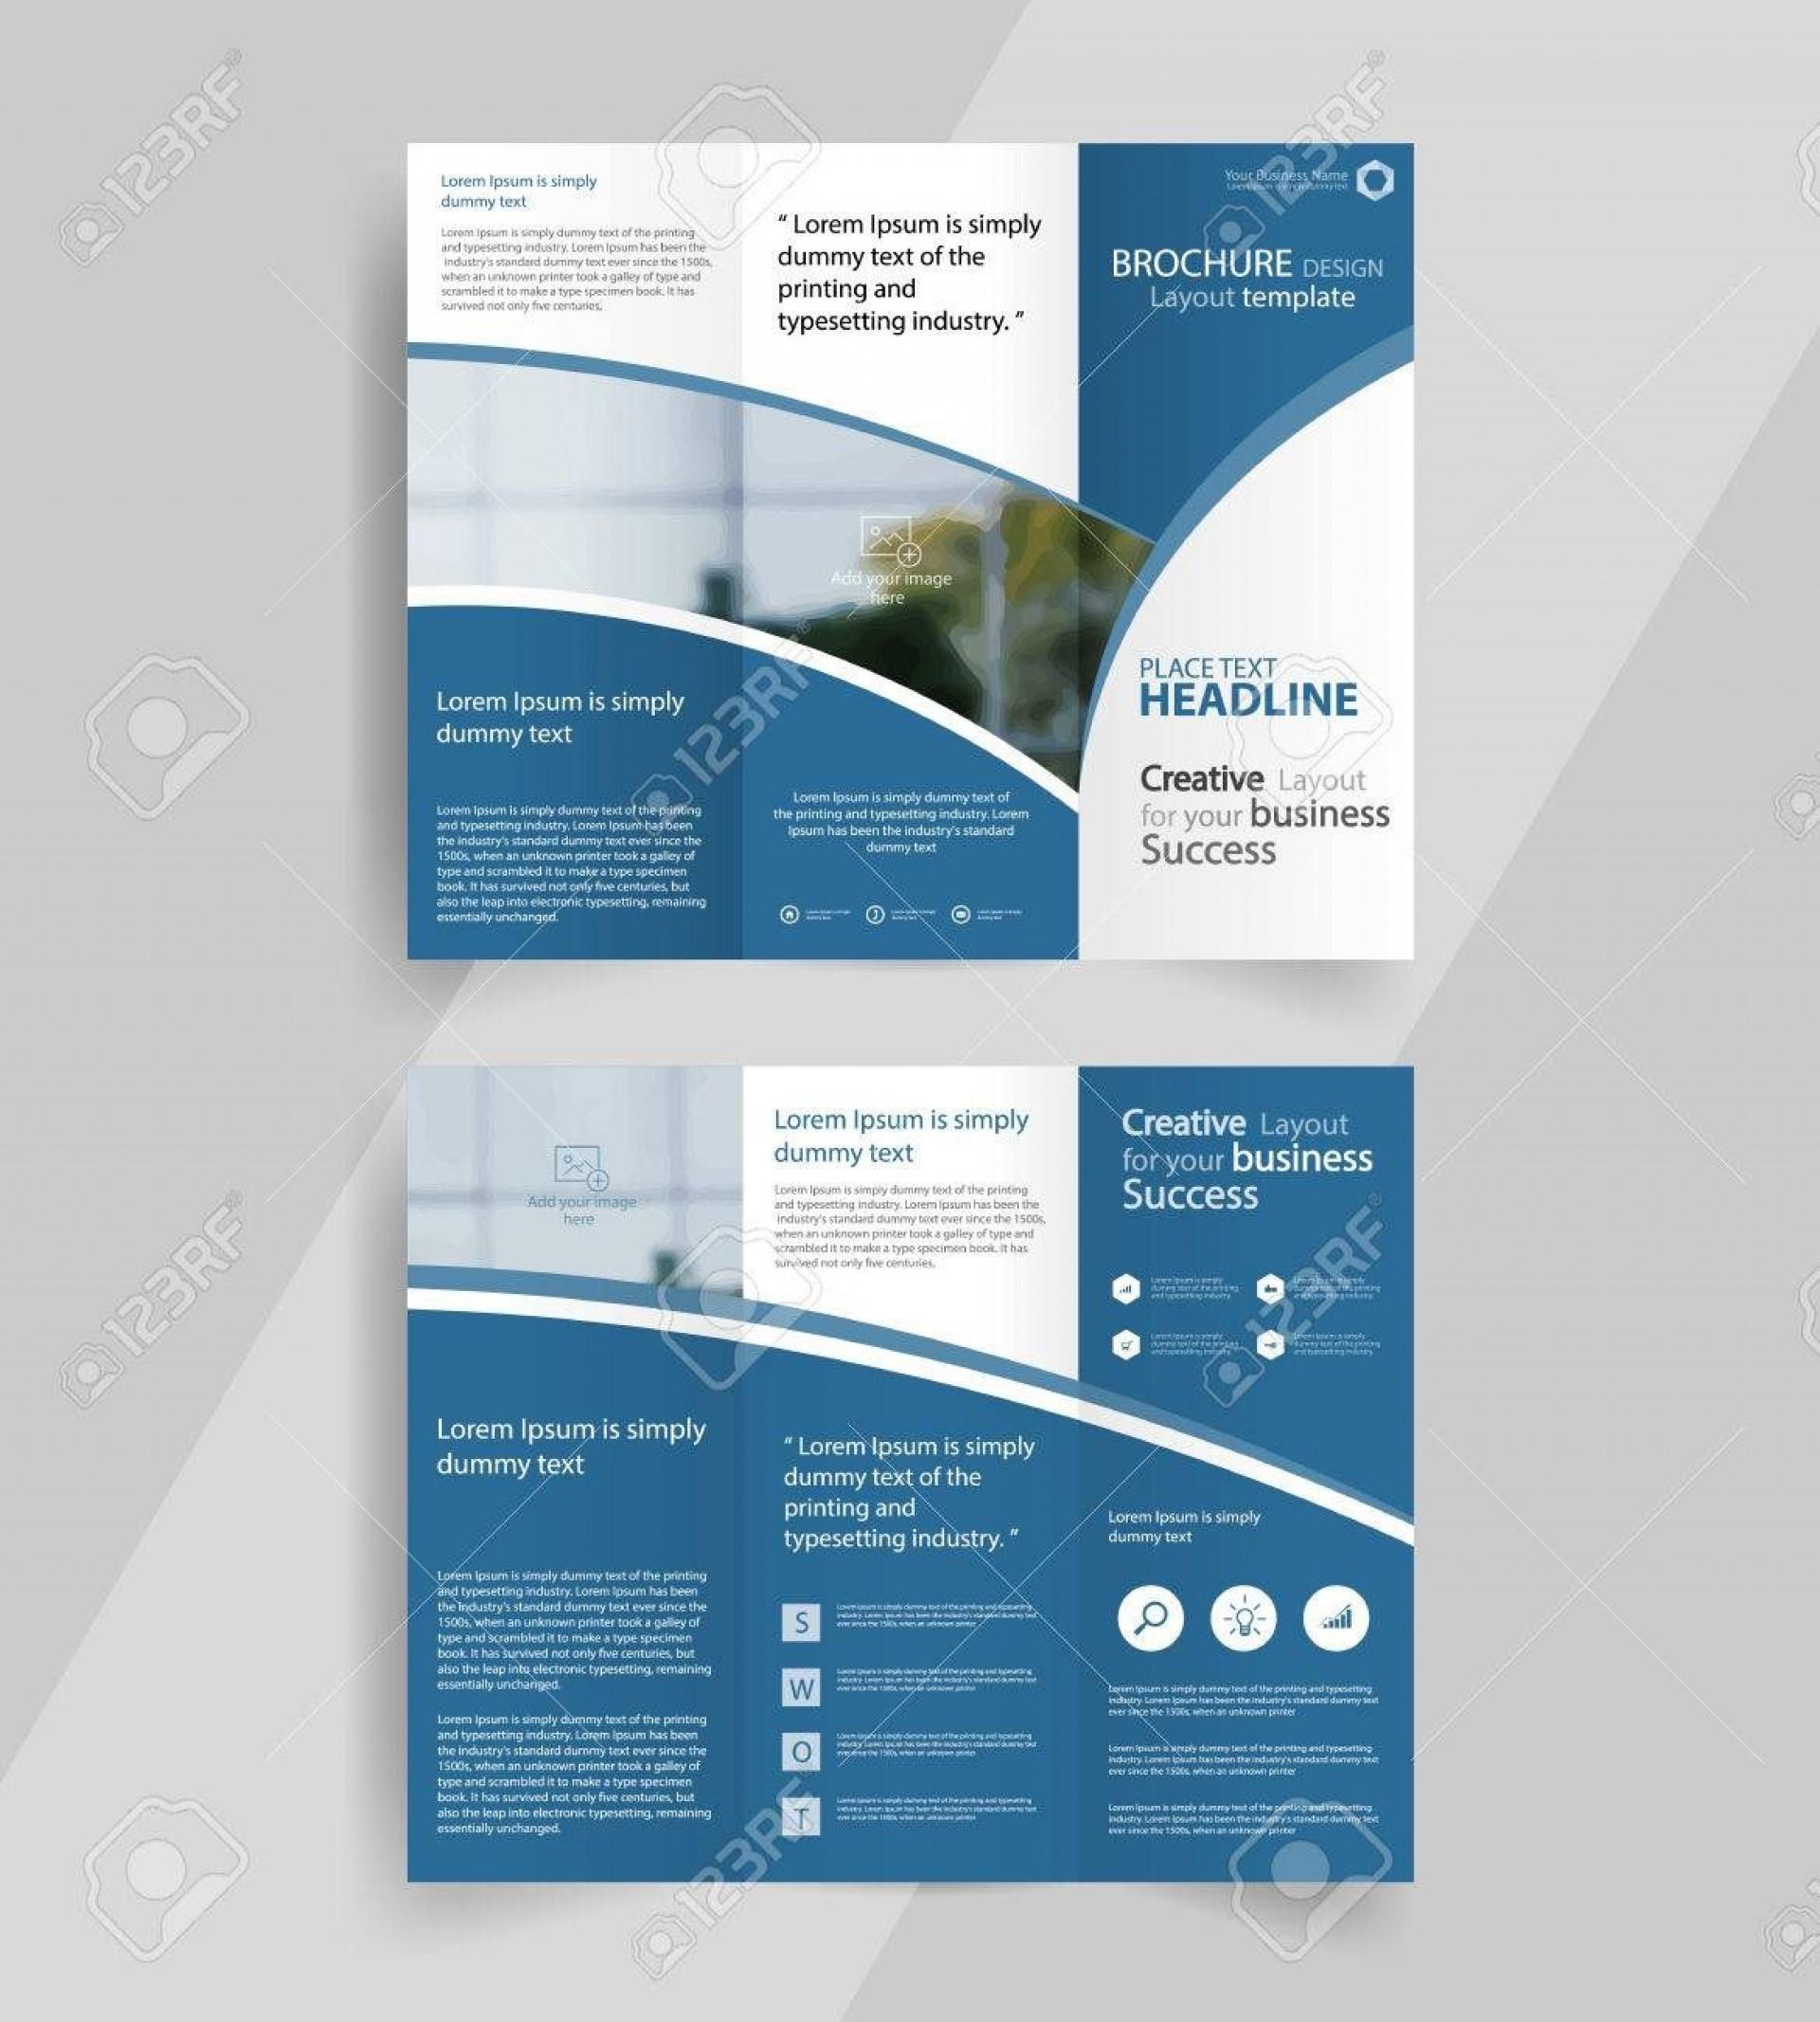 003 Impressive Tri Fold Brochure Template Free Highest Quality  Download Photoshop M Word Tri-fold Indesign Mac1920